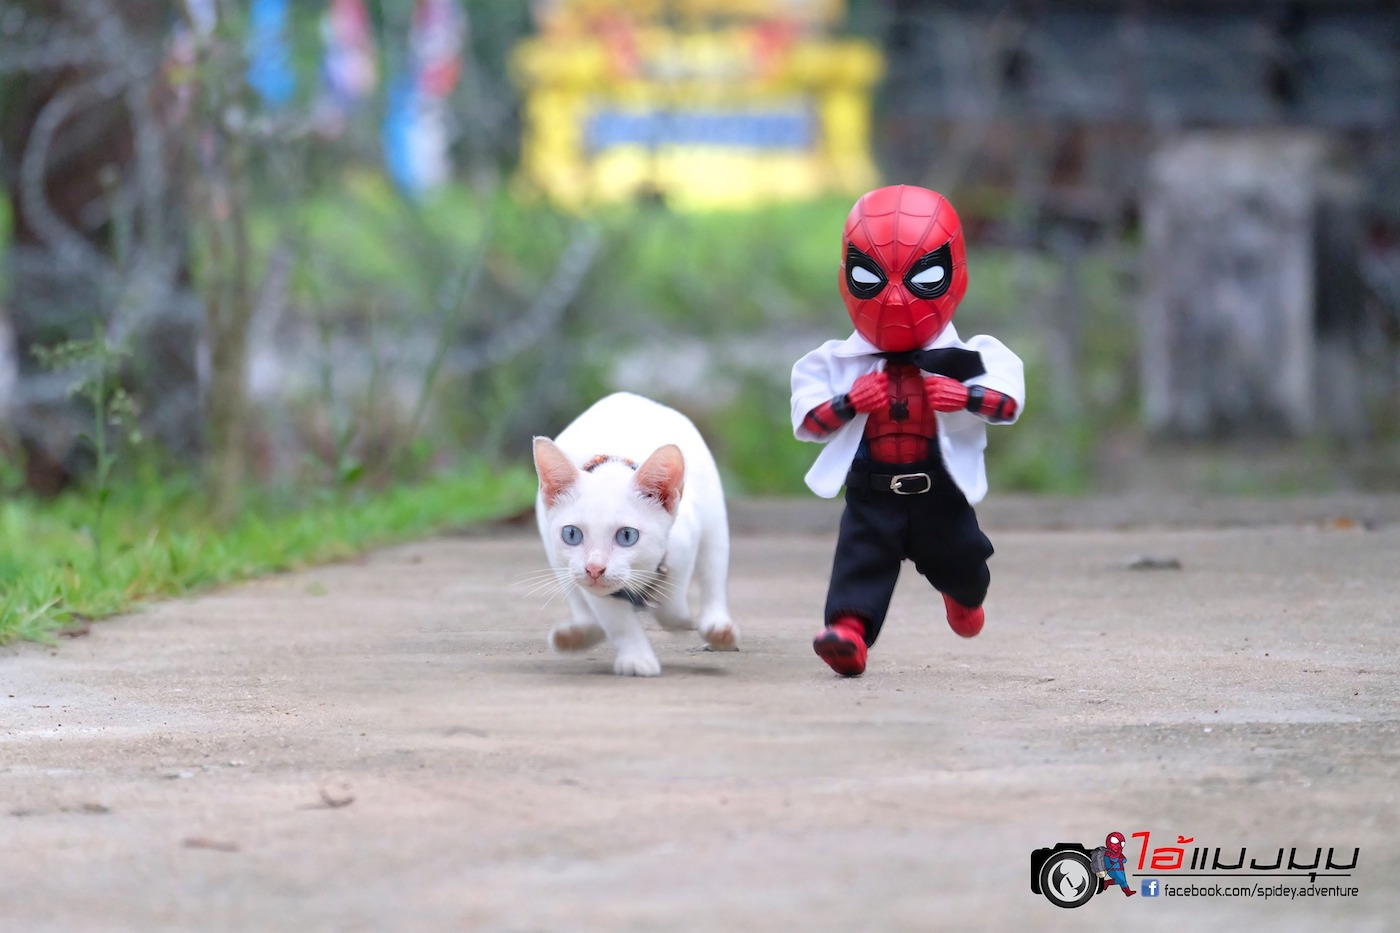 https://i1.wp.com/creapills.com/wp-content/uploads/2019/11/figurine-spiderman-chat-21.jpg?w=1400&ssl=1